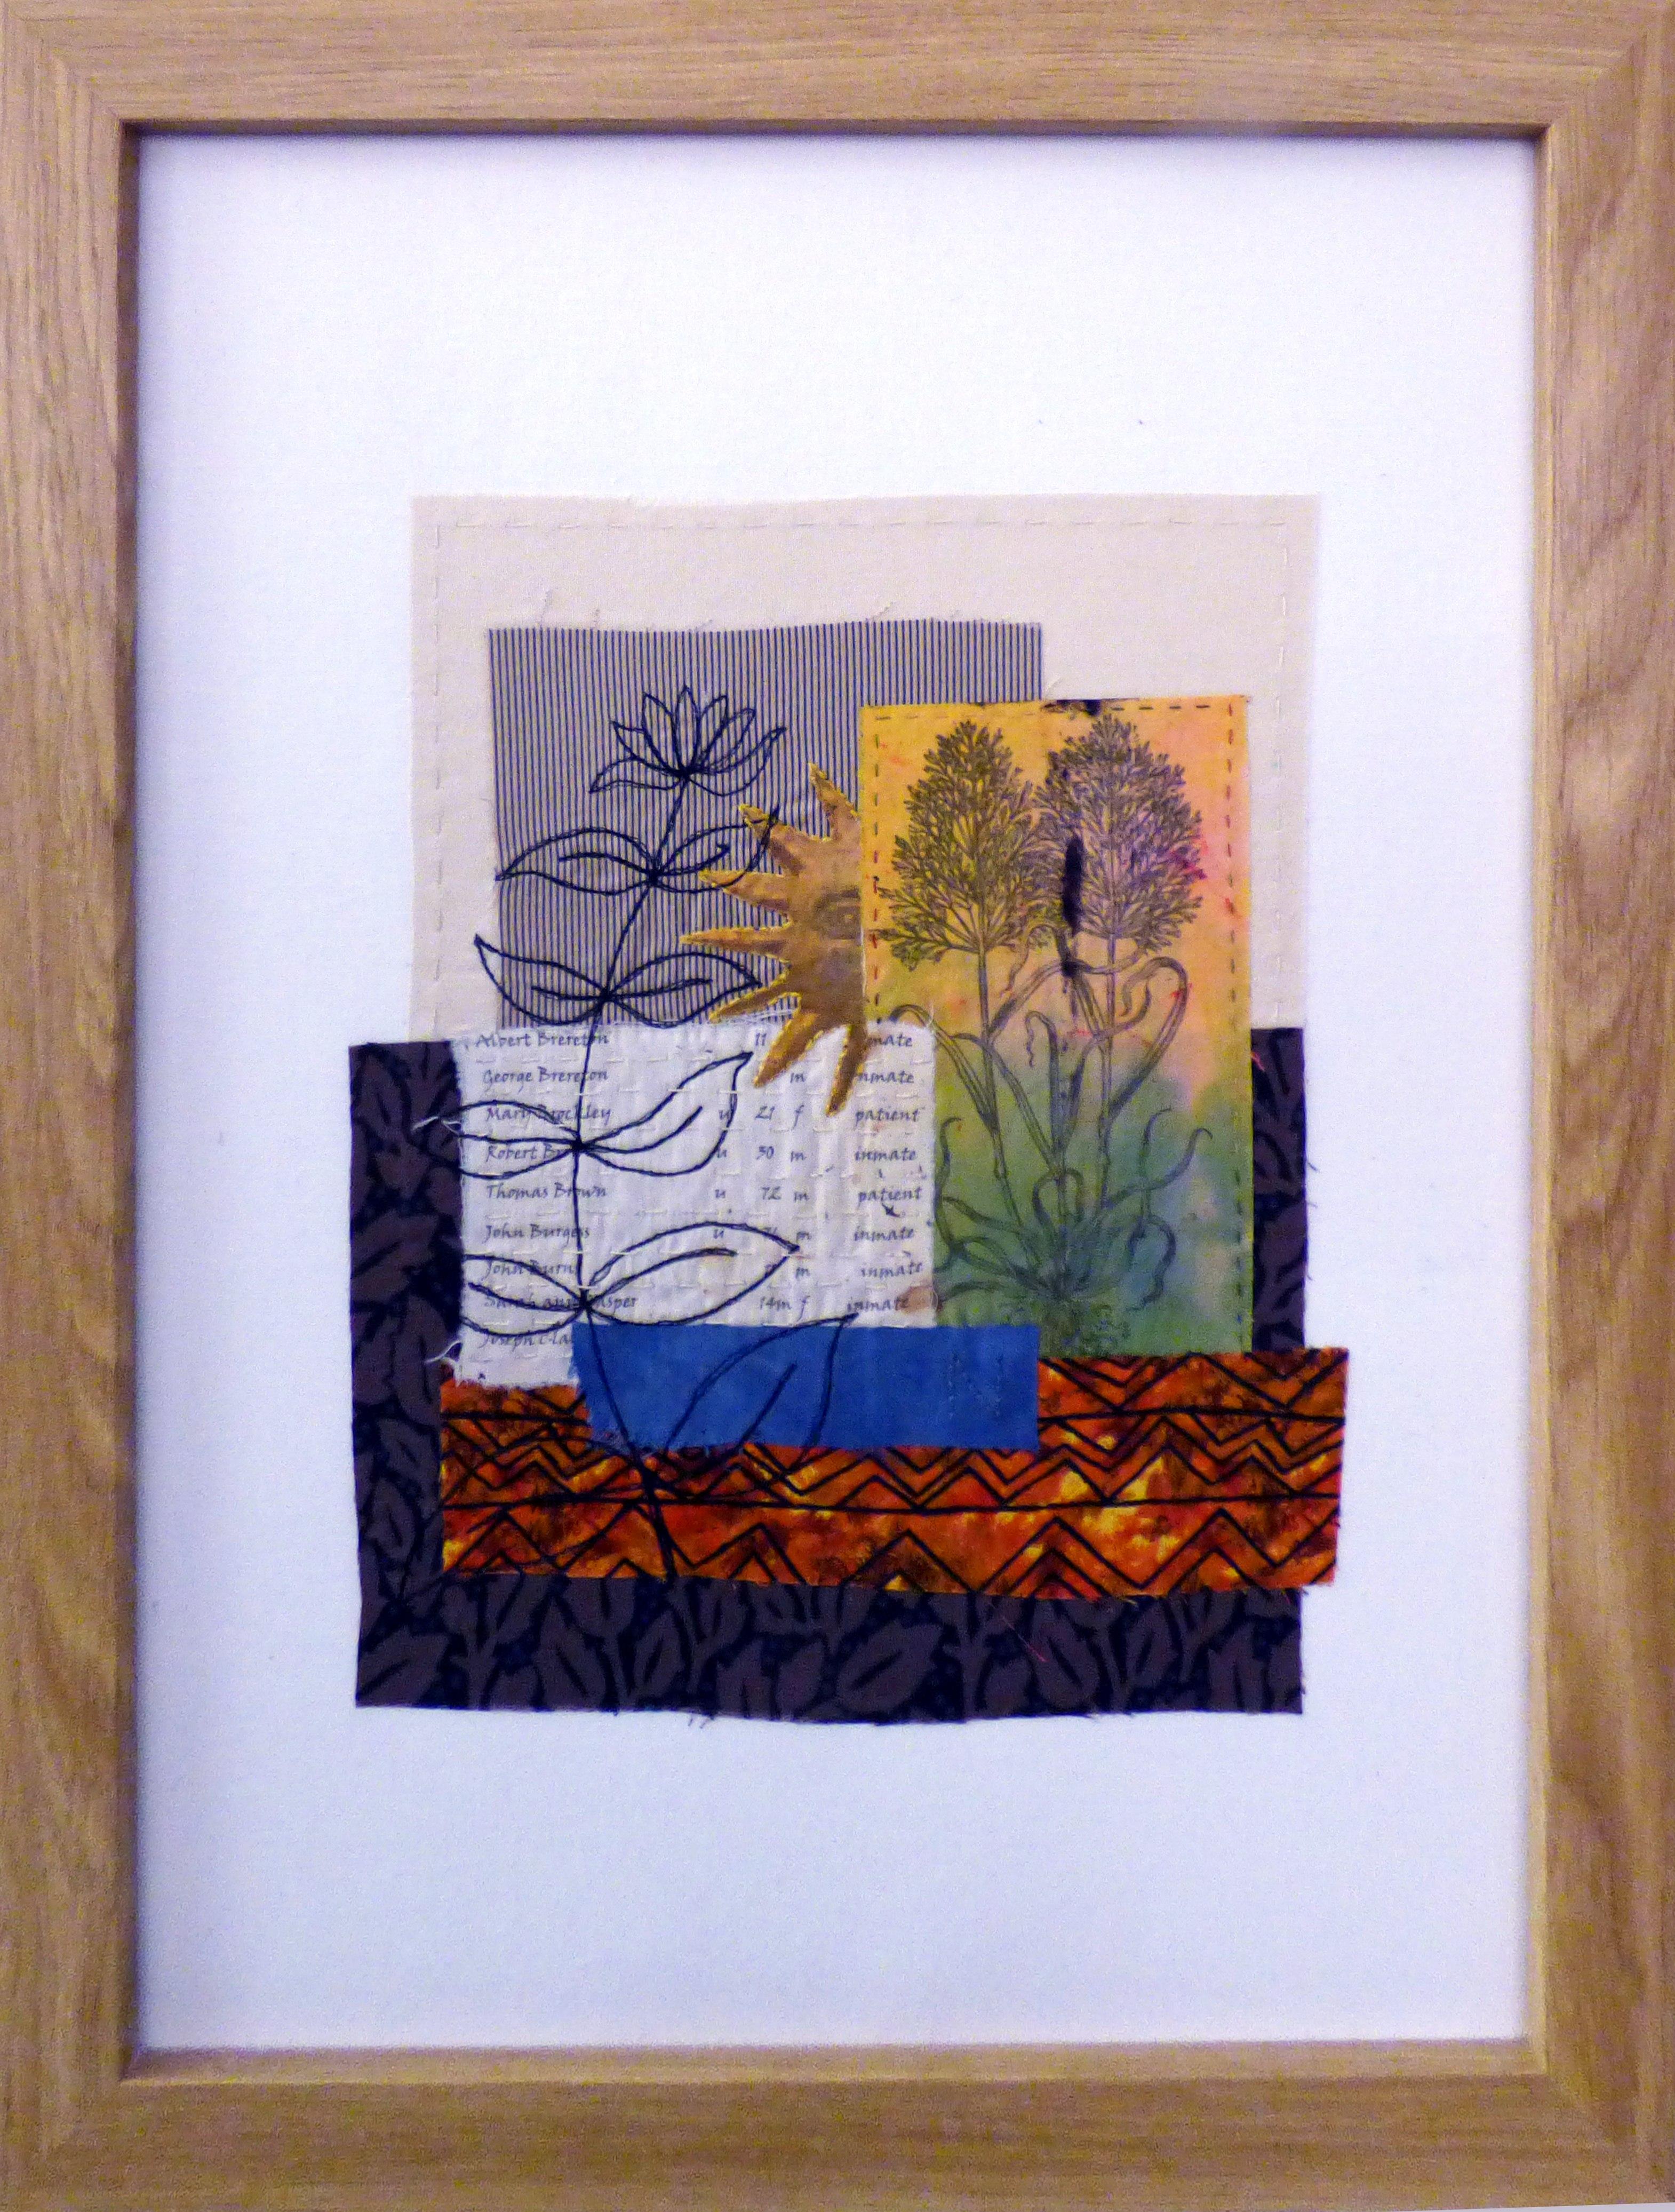 REFLECTIONS OF THE PAST 1 by Linda Bilsborrow, Ten Plus exhibition, Nantwich